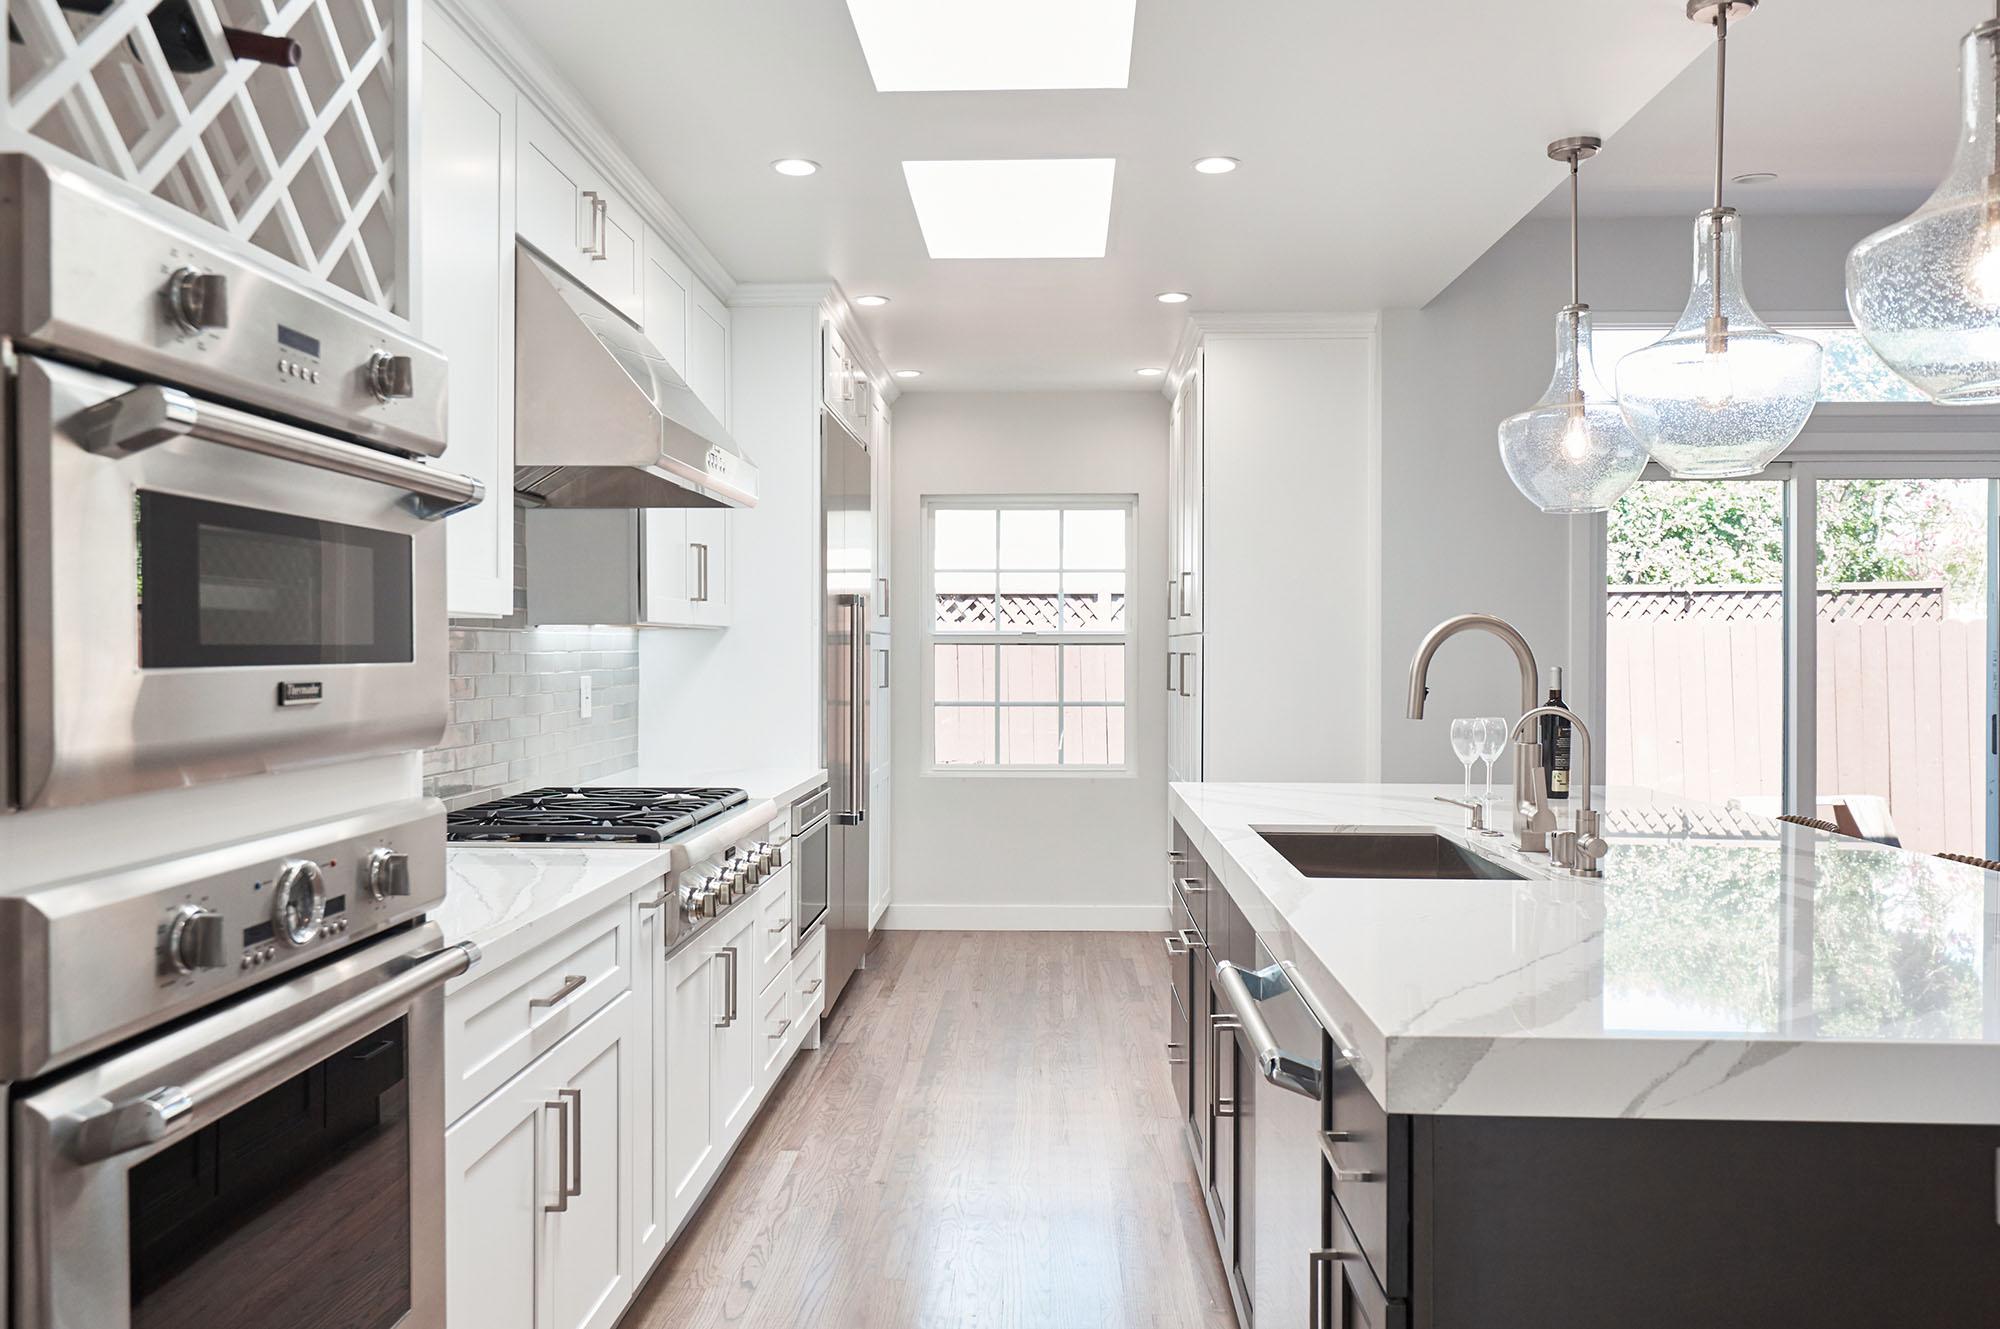 Studio City kitchen remodel 4 SMALL.jpg